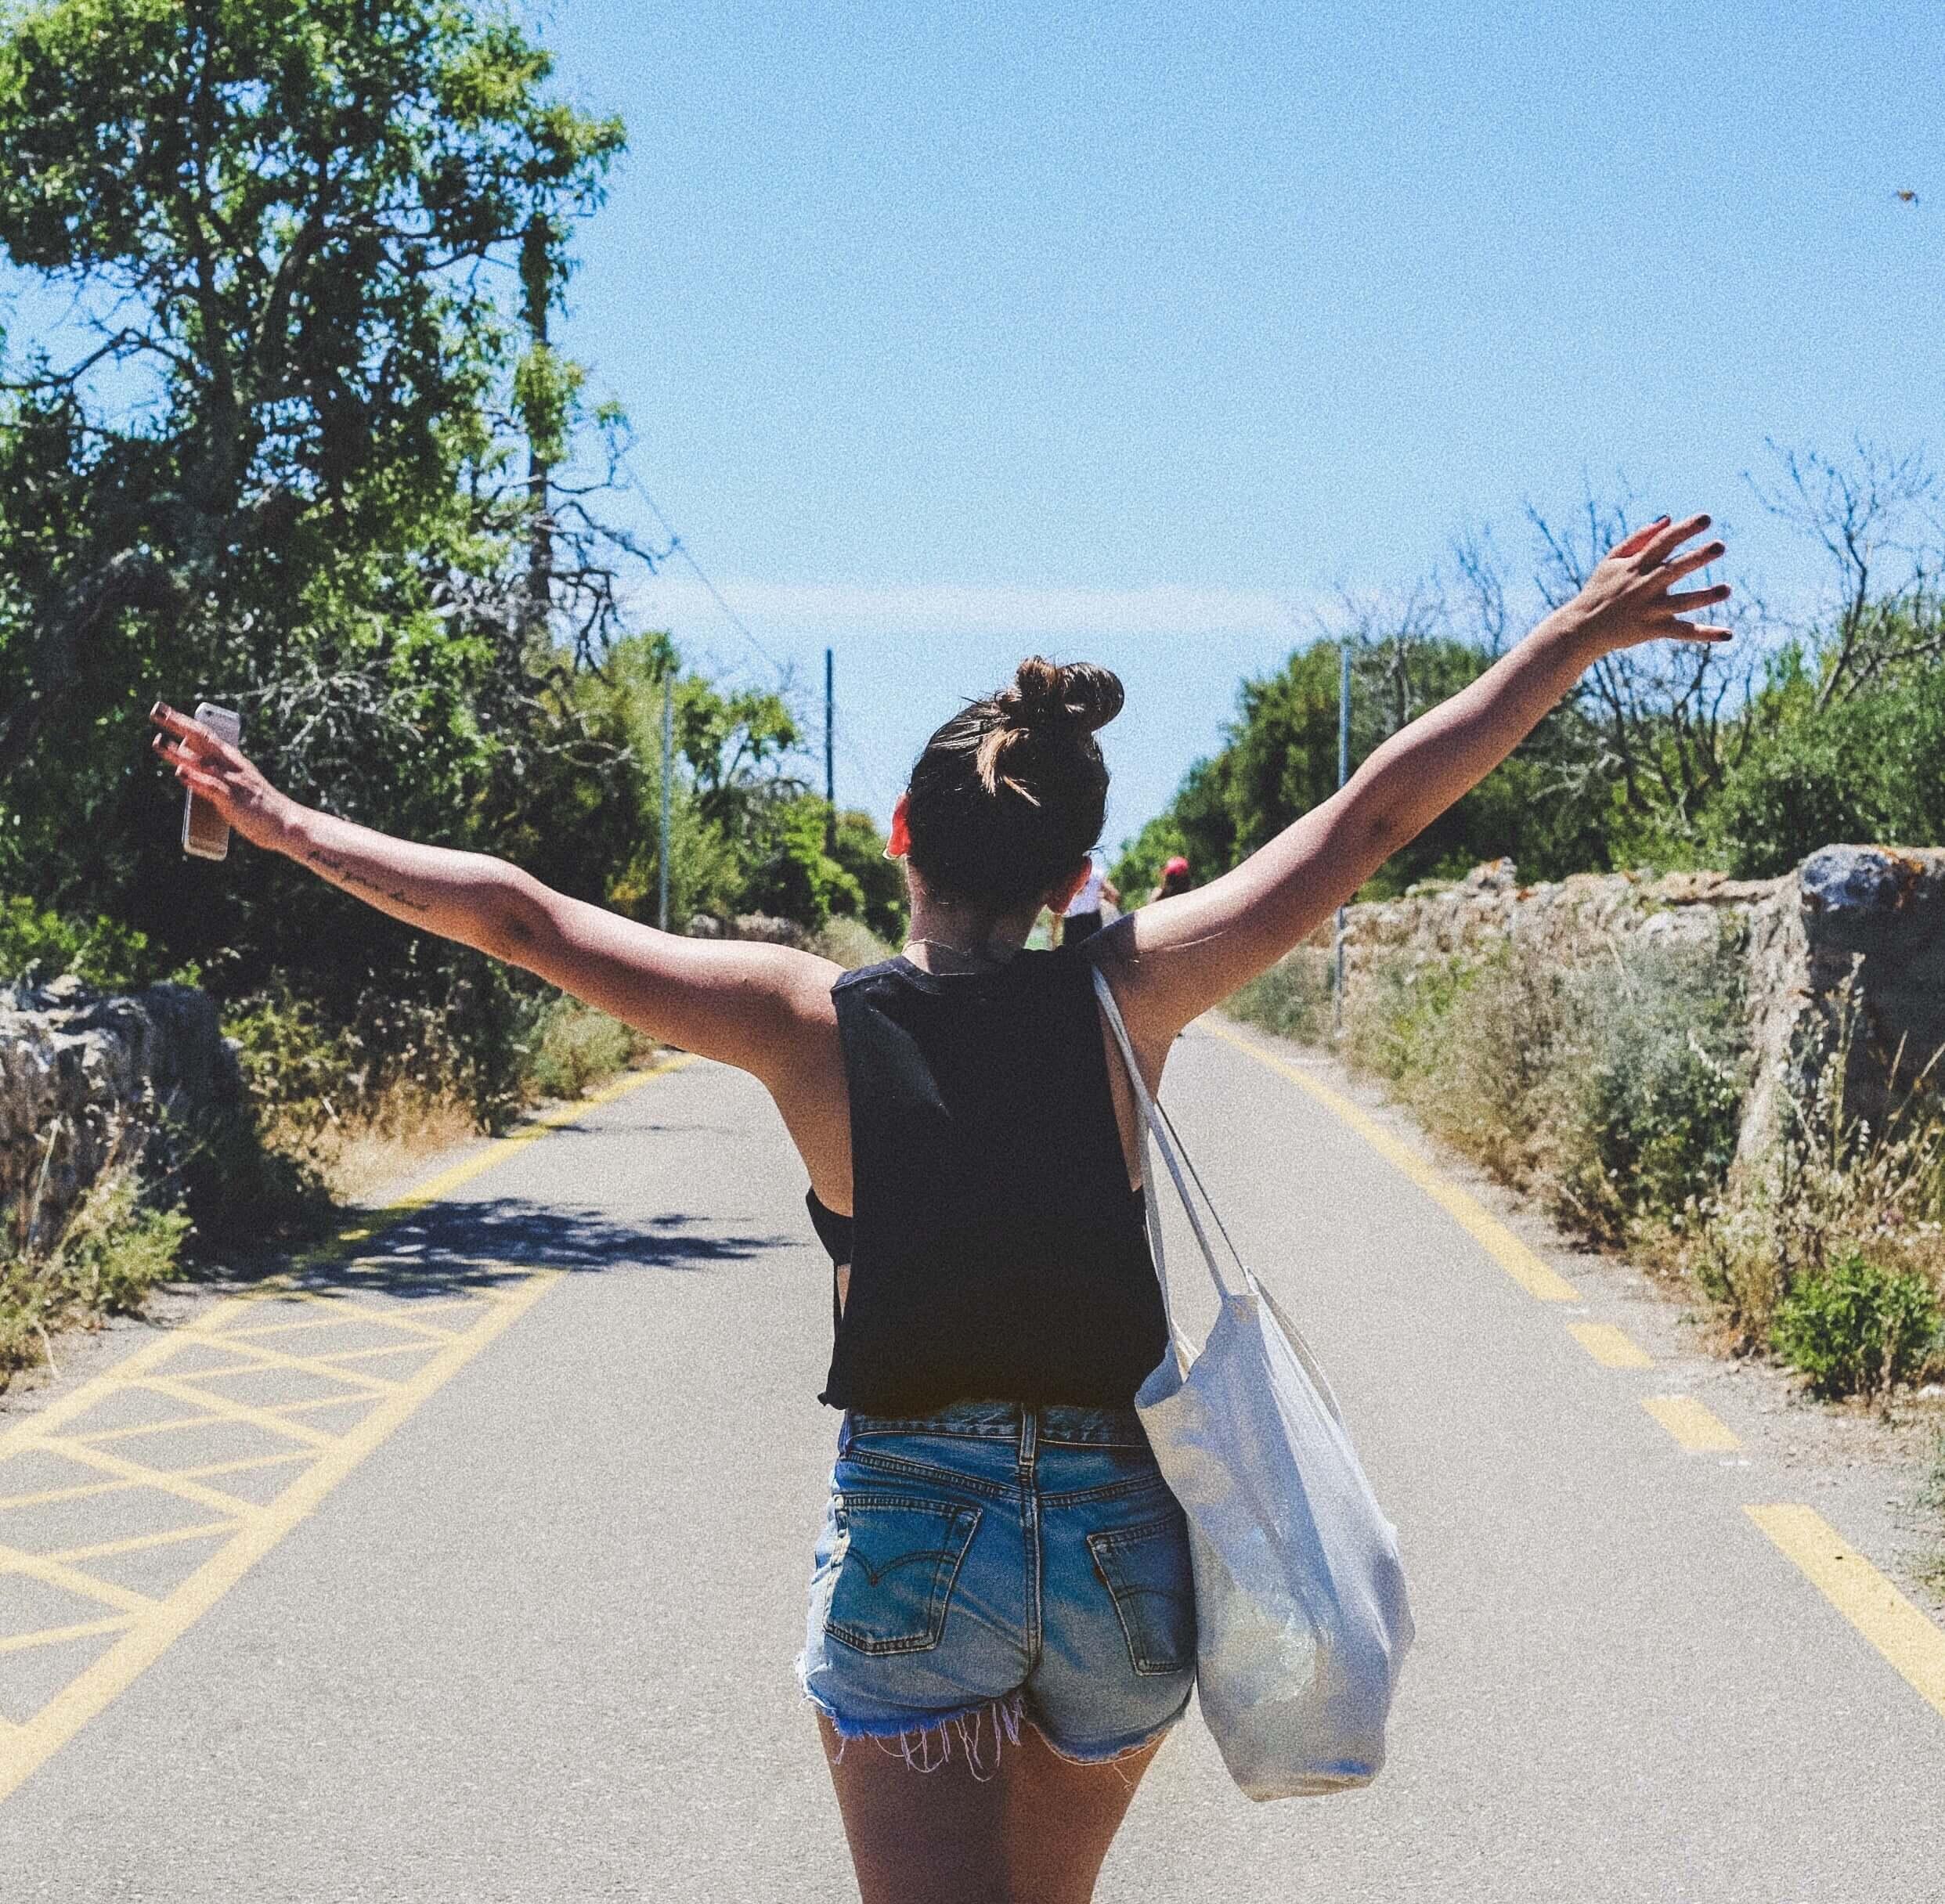 Ein paar Sommer-Favorites | Musik, Food & Dinge